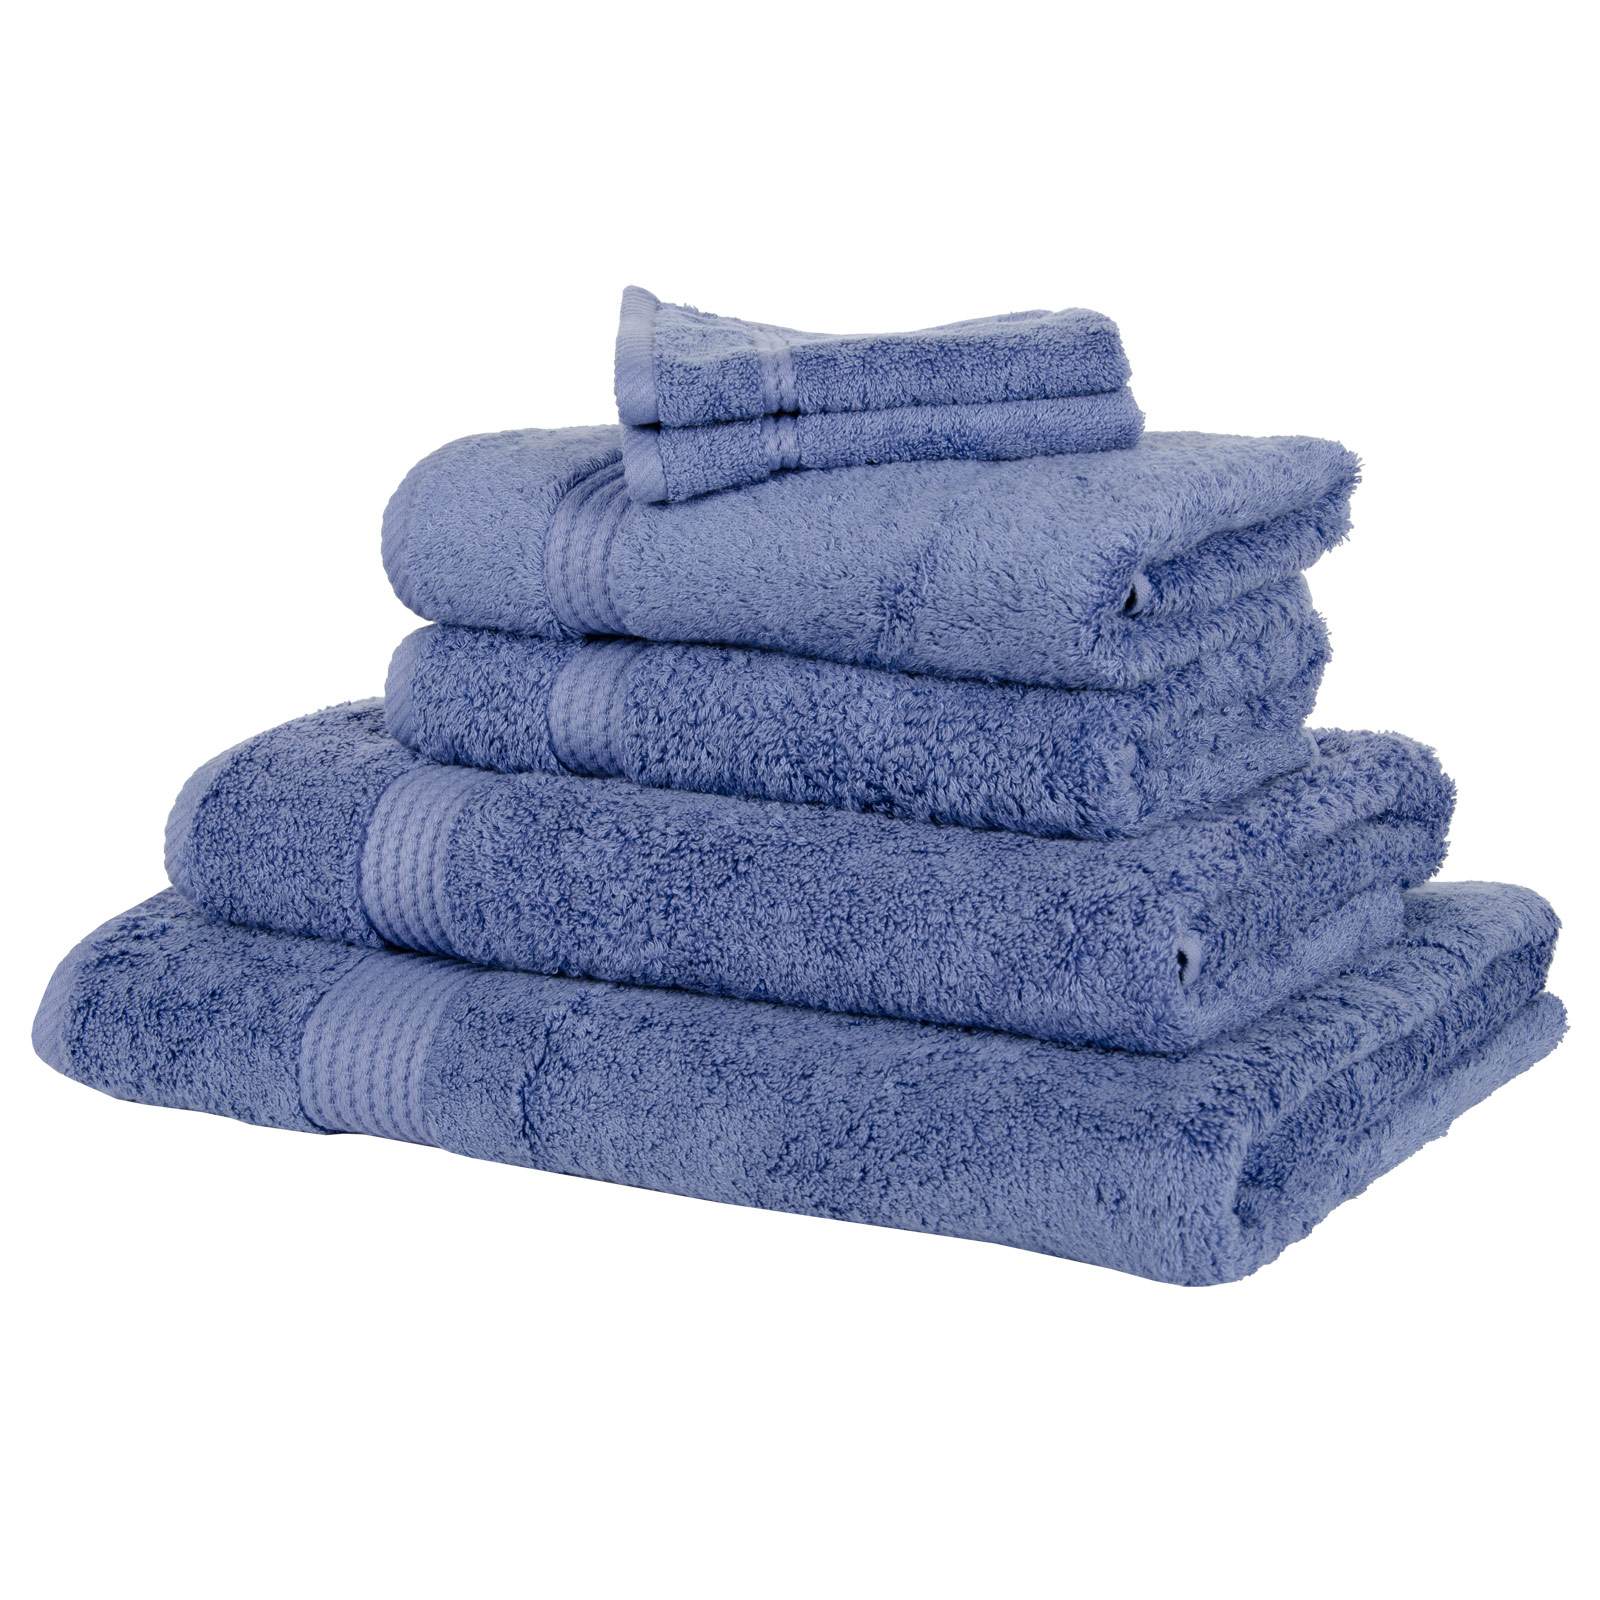 Luxury Bathrooms Egypt luxury soft bamboo bathroom bath linen face cloth flannel sheet